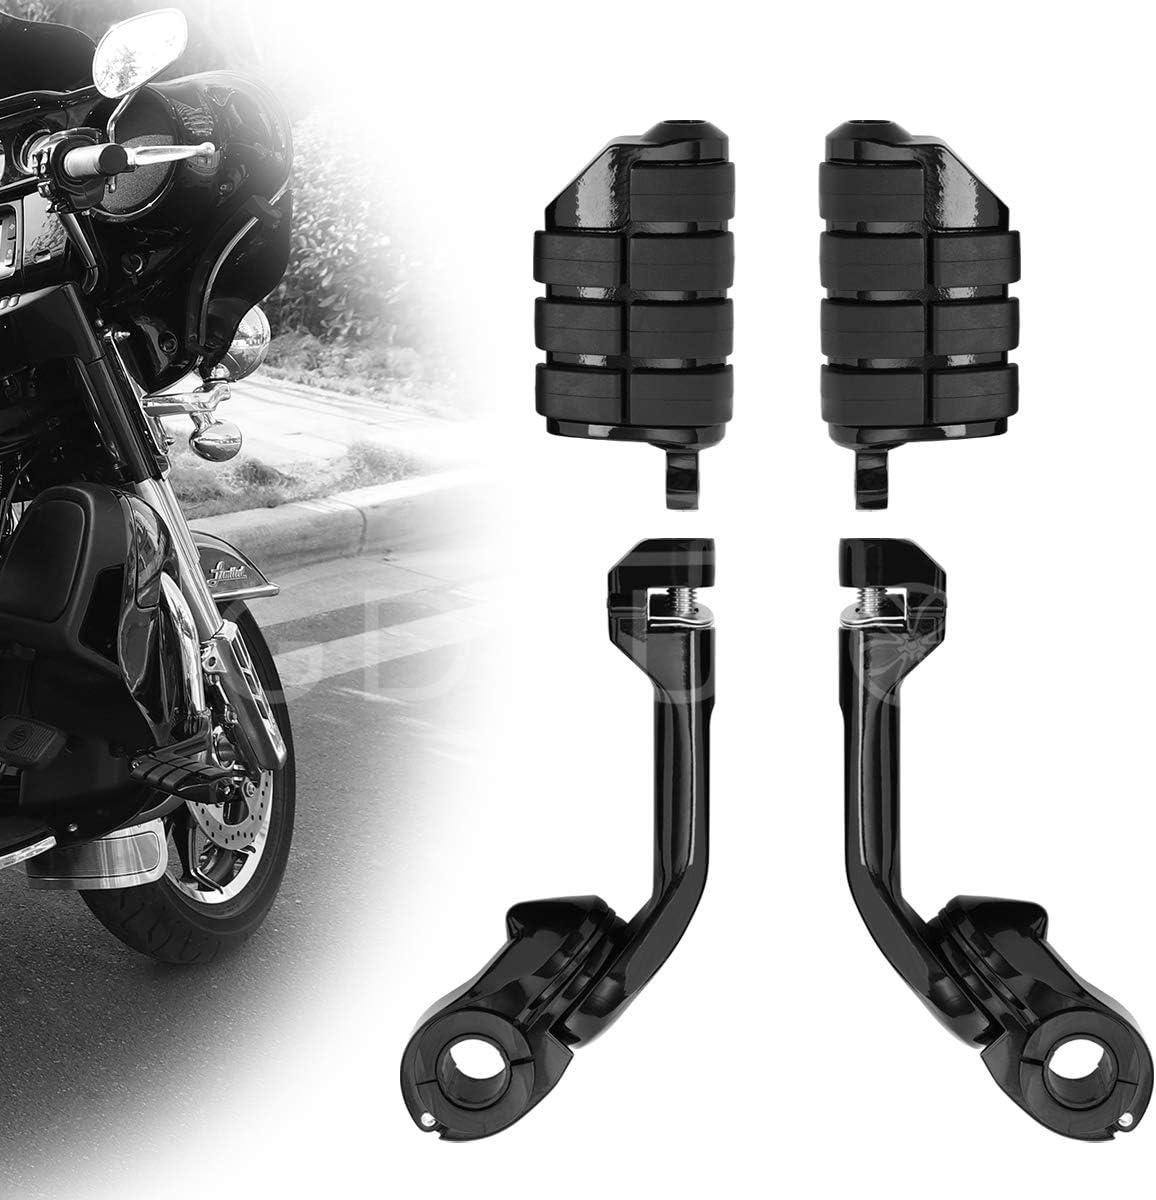 Highway Pegs Motorcycle Footpegs Foot Rest(Black) for Harley Honda Road King Street Glide Yamaha Suzuki Kawasaki Engine Guard